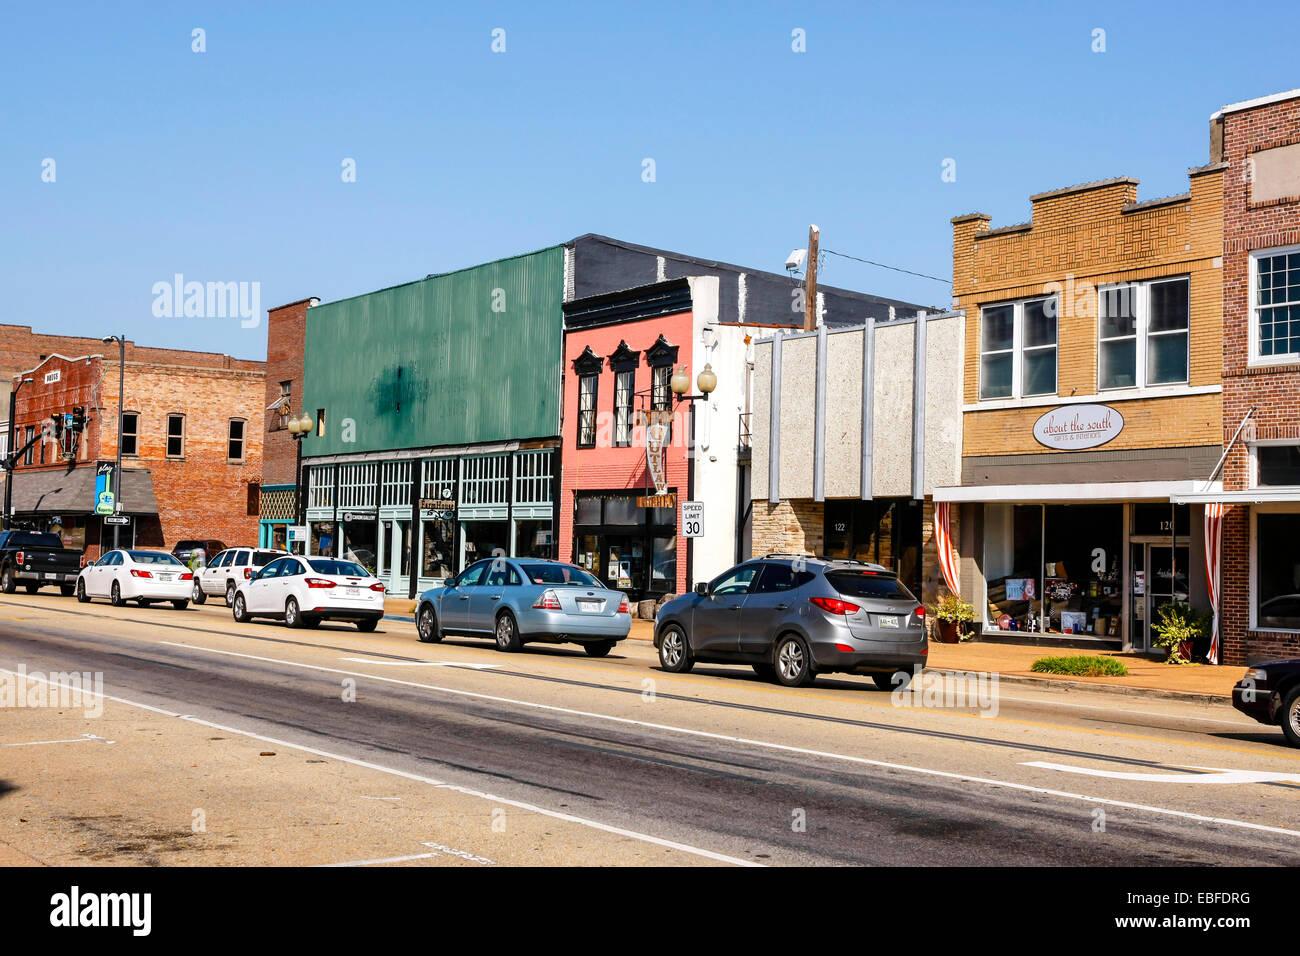 Main Street in Tupelo city Mississippi, hometown of Elvis Presley - Stock Image